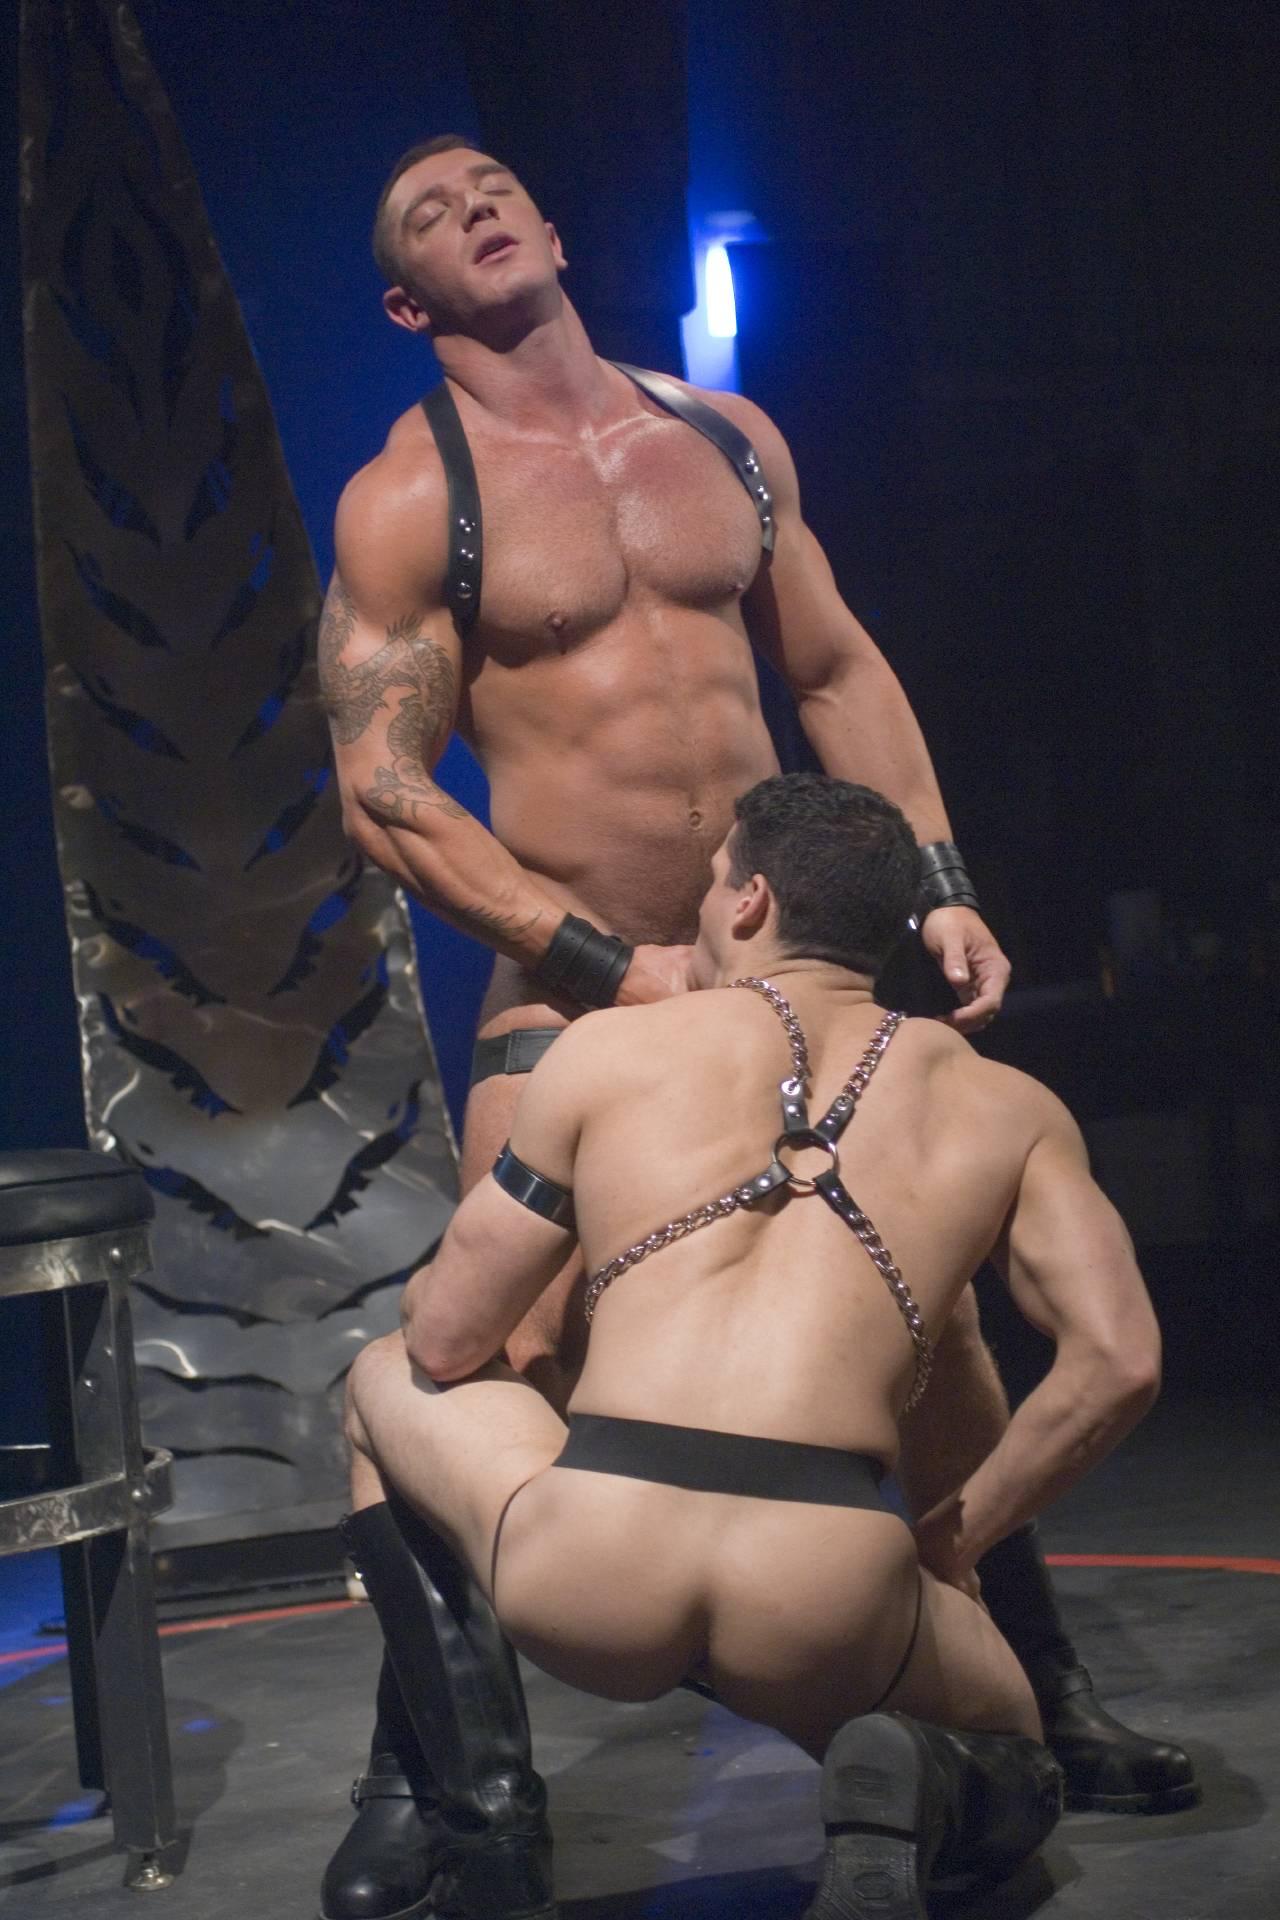 Gay hardcore raging stallion massive blac